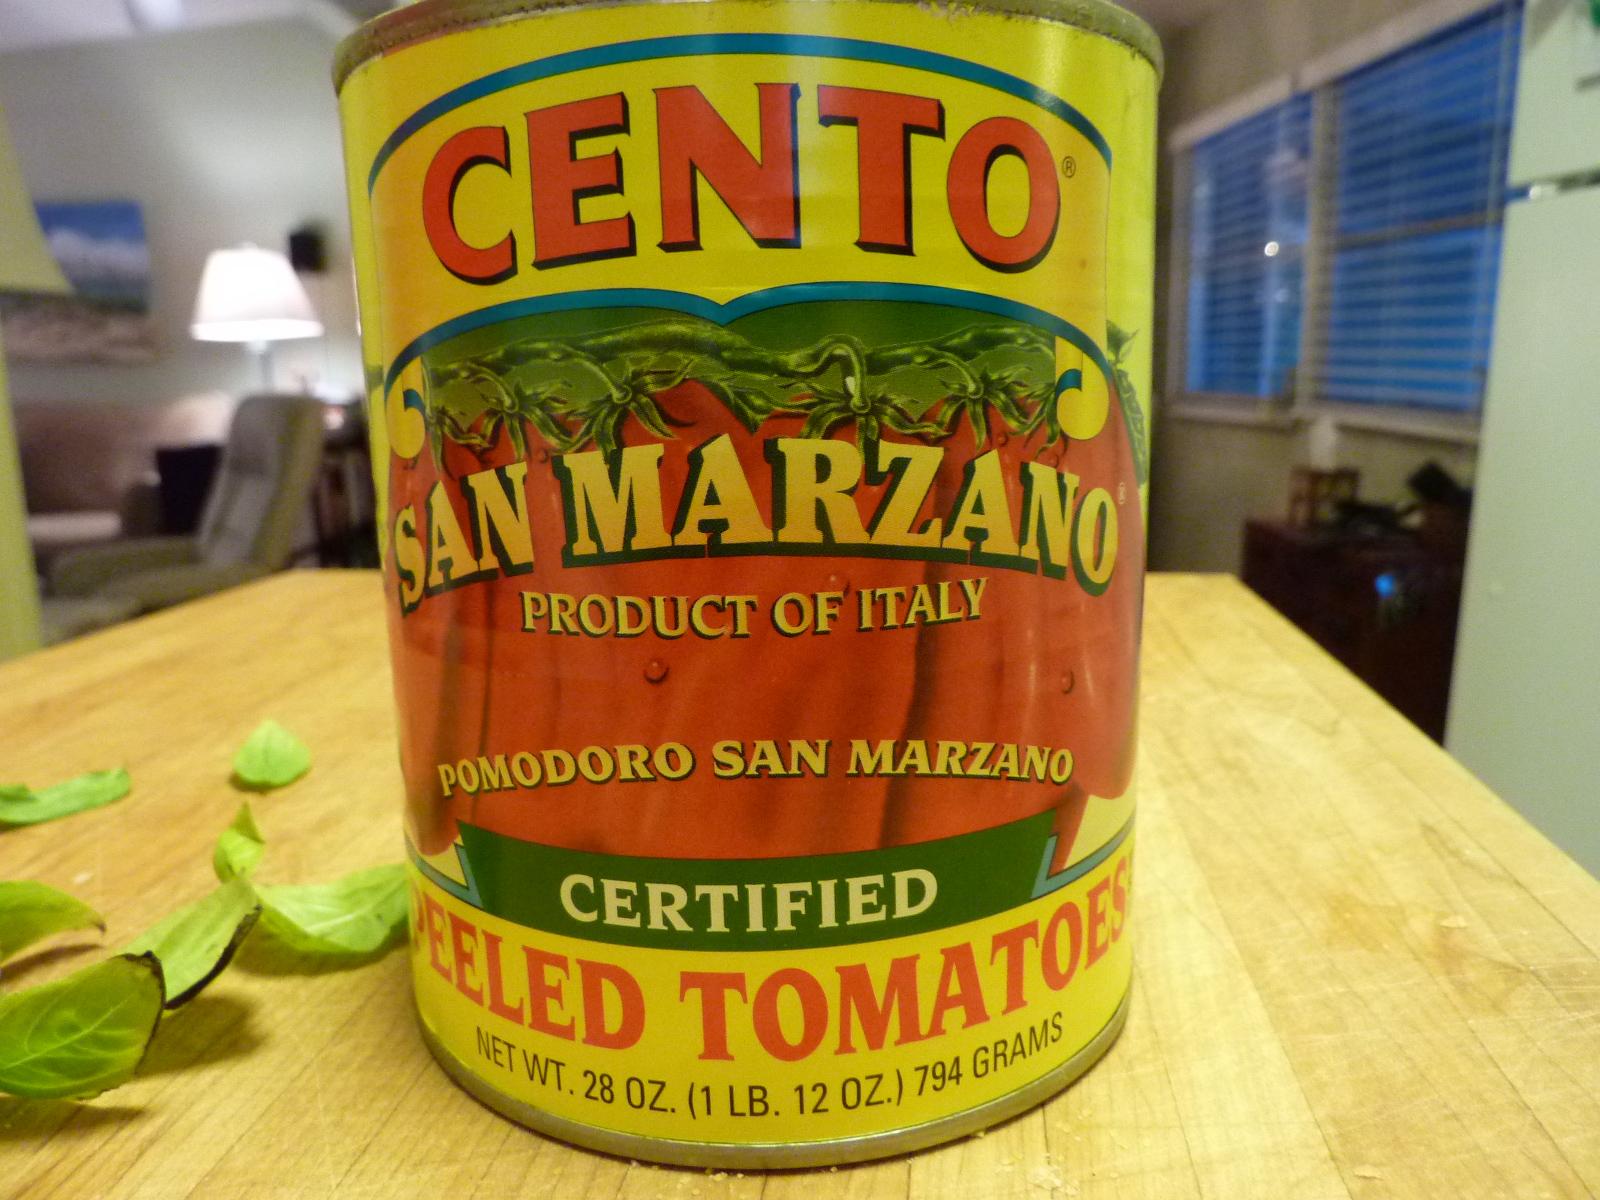 san marzano tomatoes where to buy